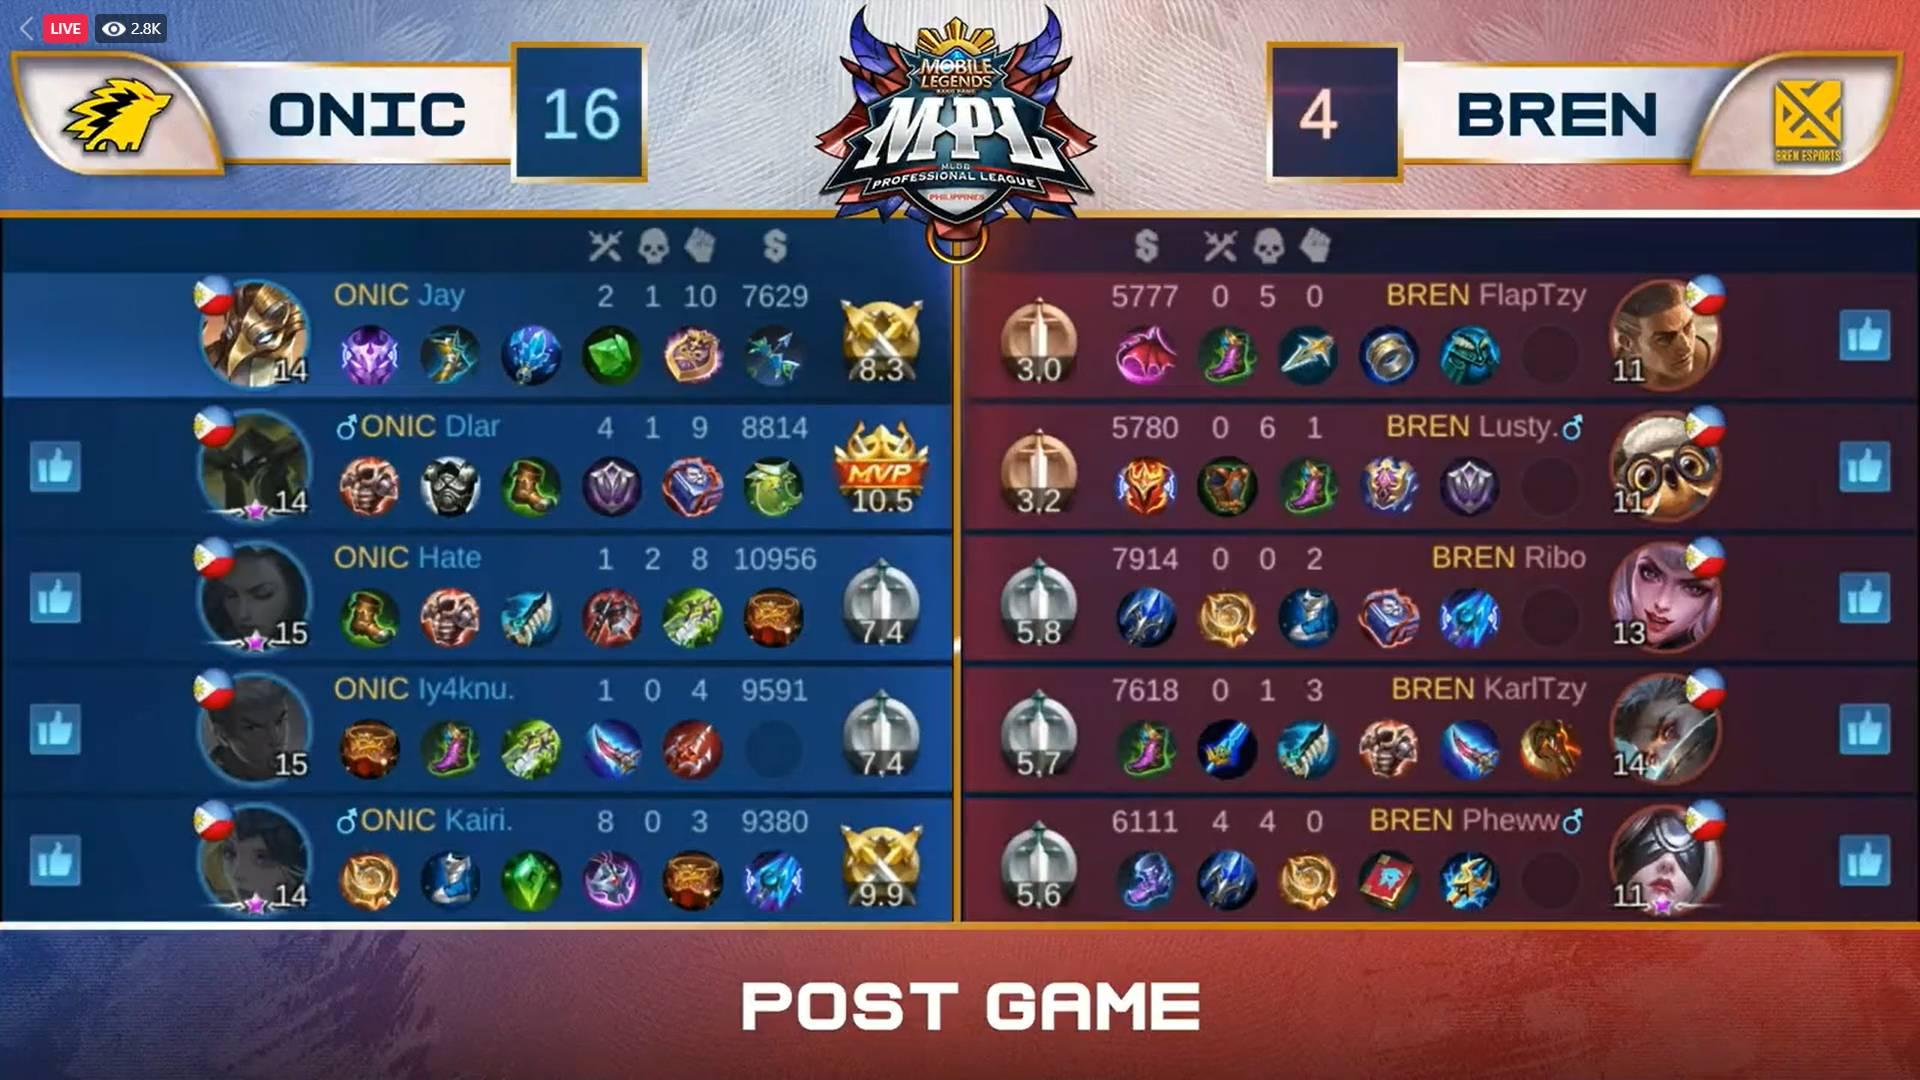 MPL-PH-7-Onic-def-Bren-Game-3 Kairi makes god bleed as ONIC upsets world champ BREN in MPL-PH ESports Mobile Legends MPL-PH News  - philippine sports news